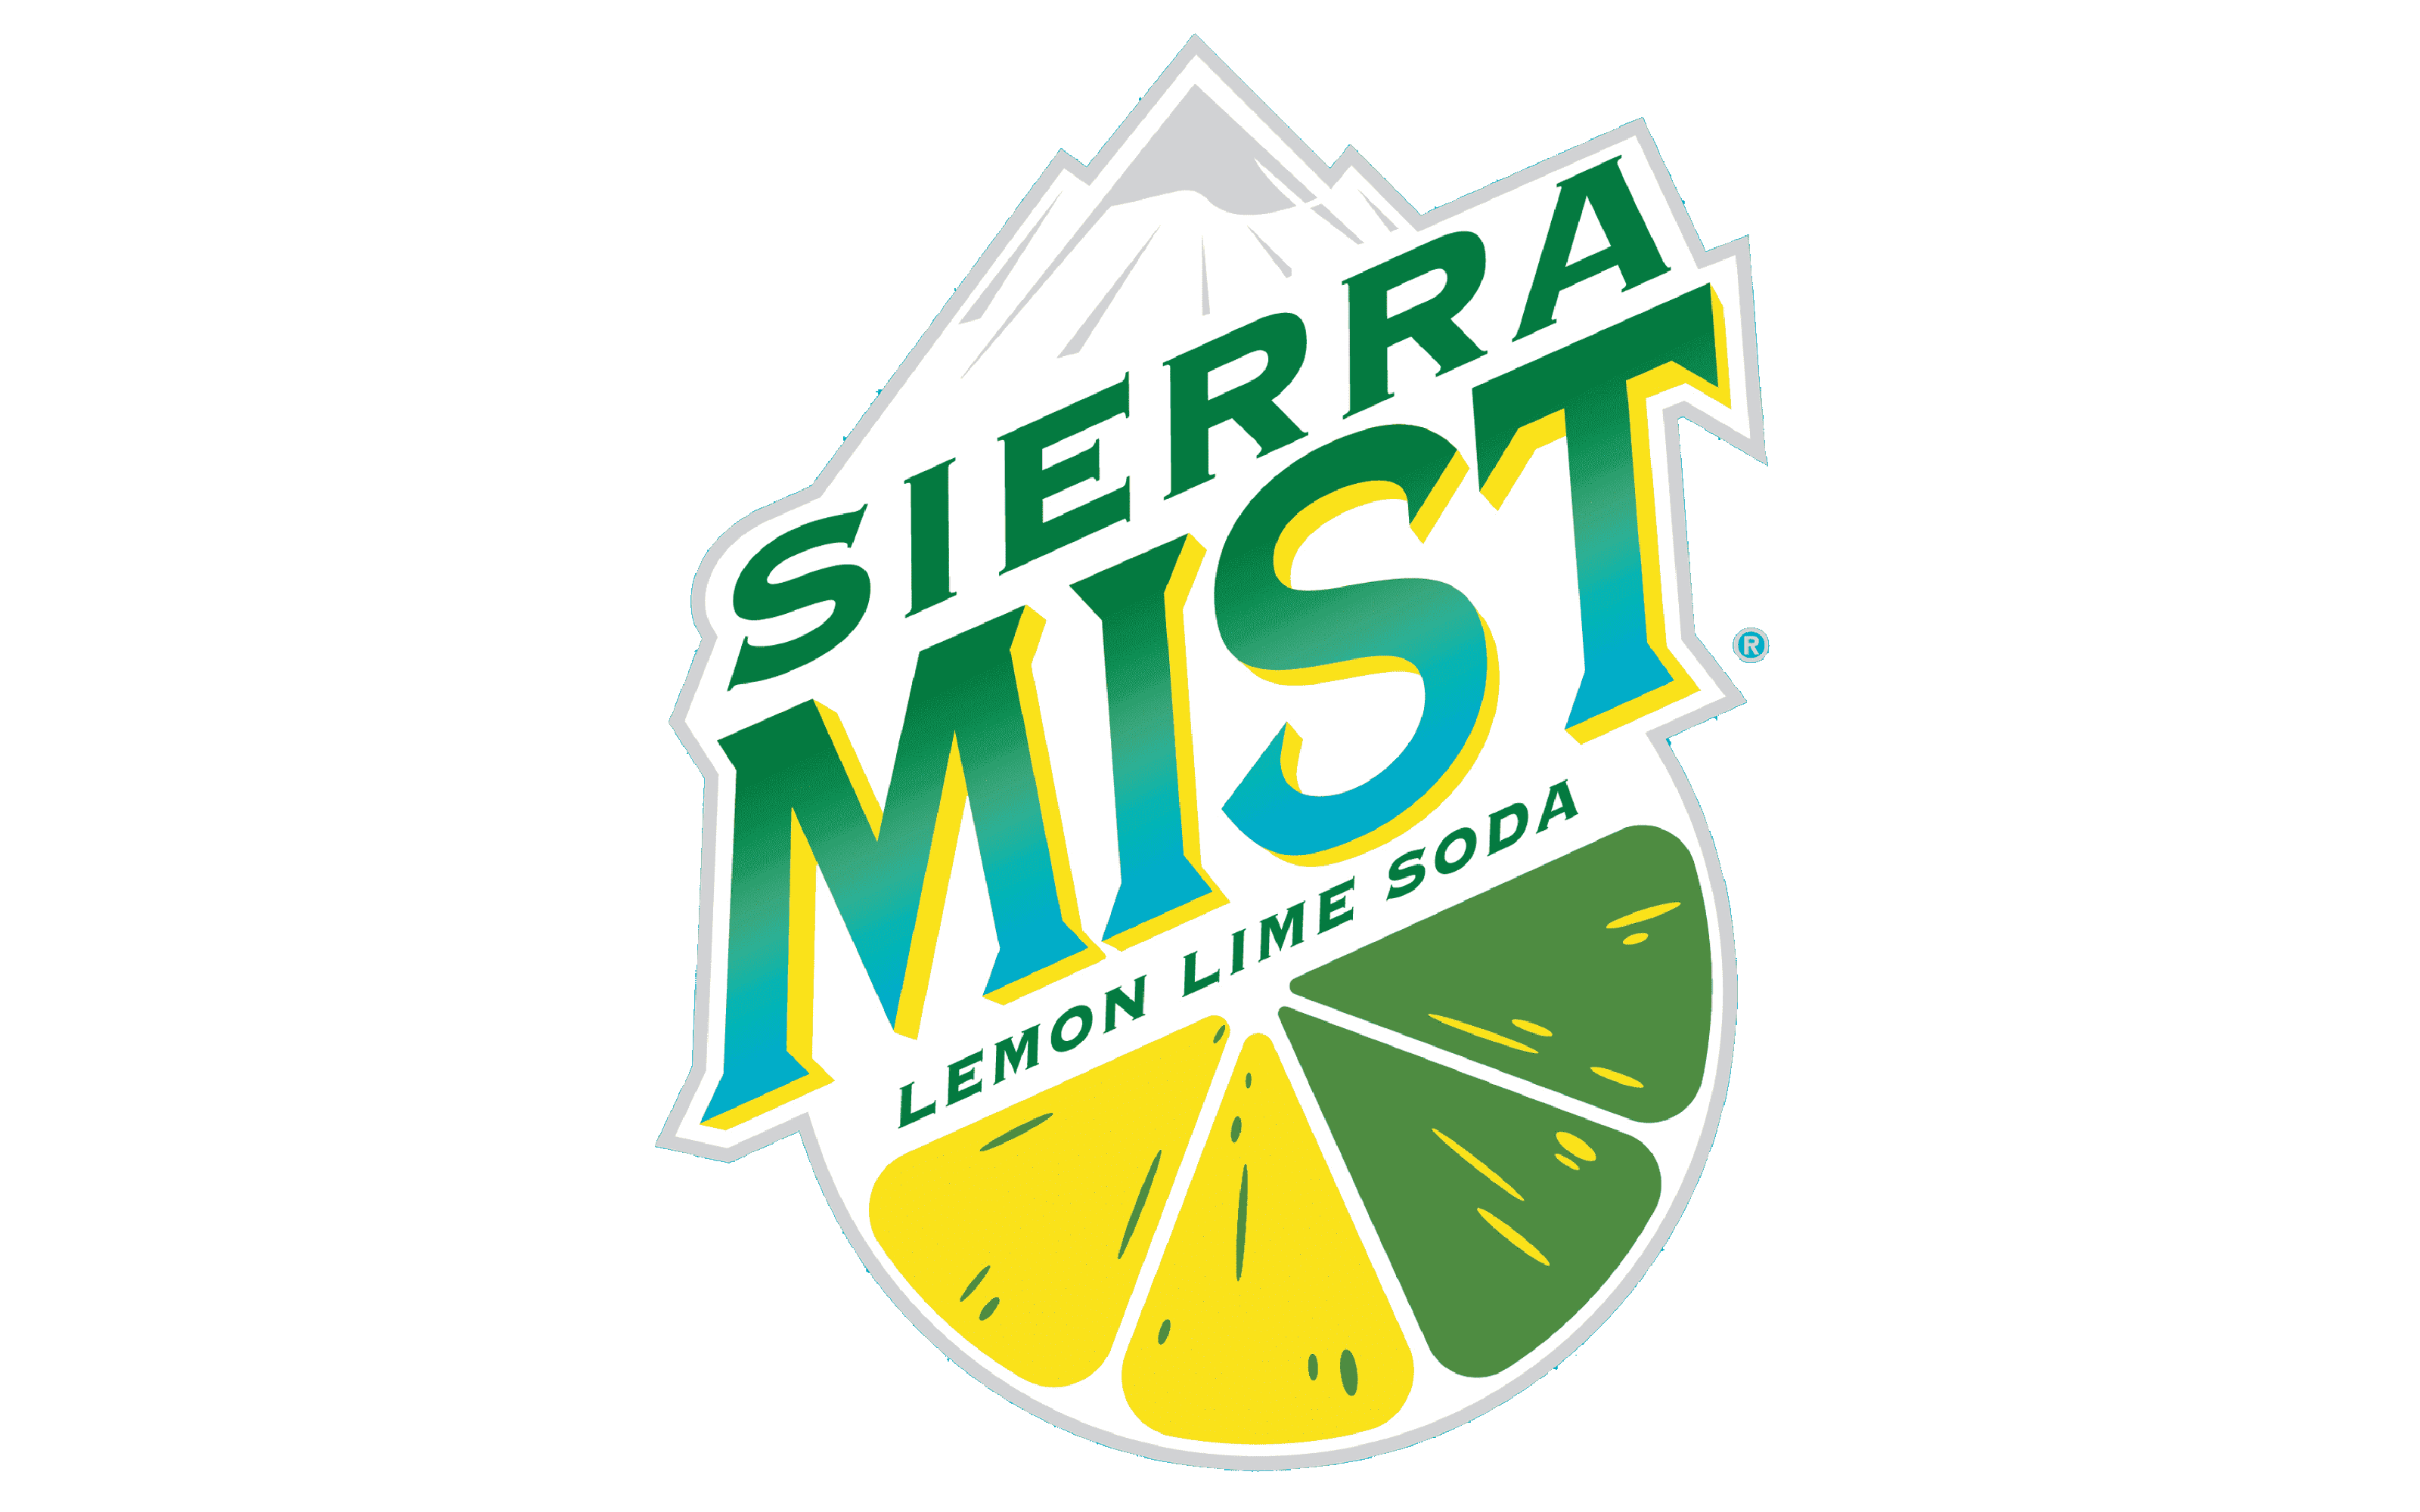 Sierra-Mist-Logo